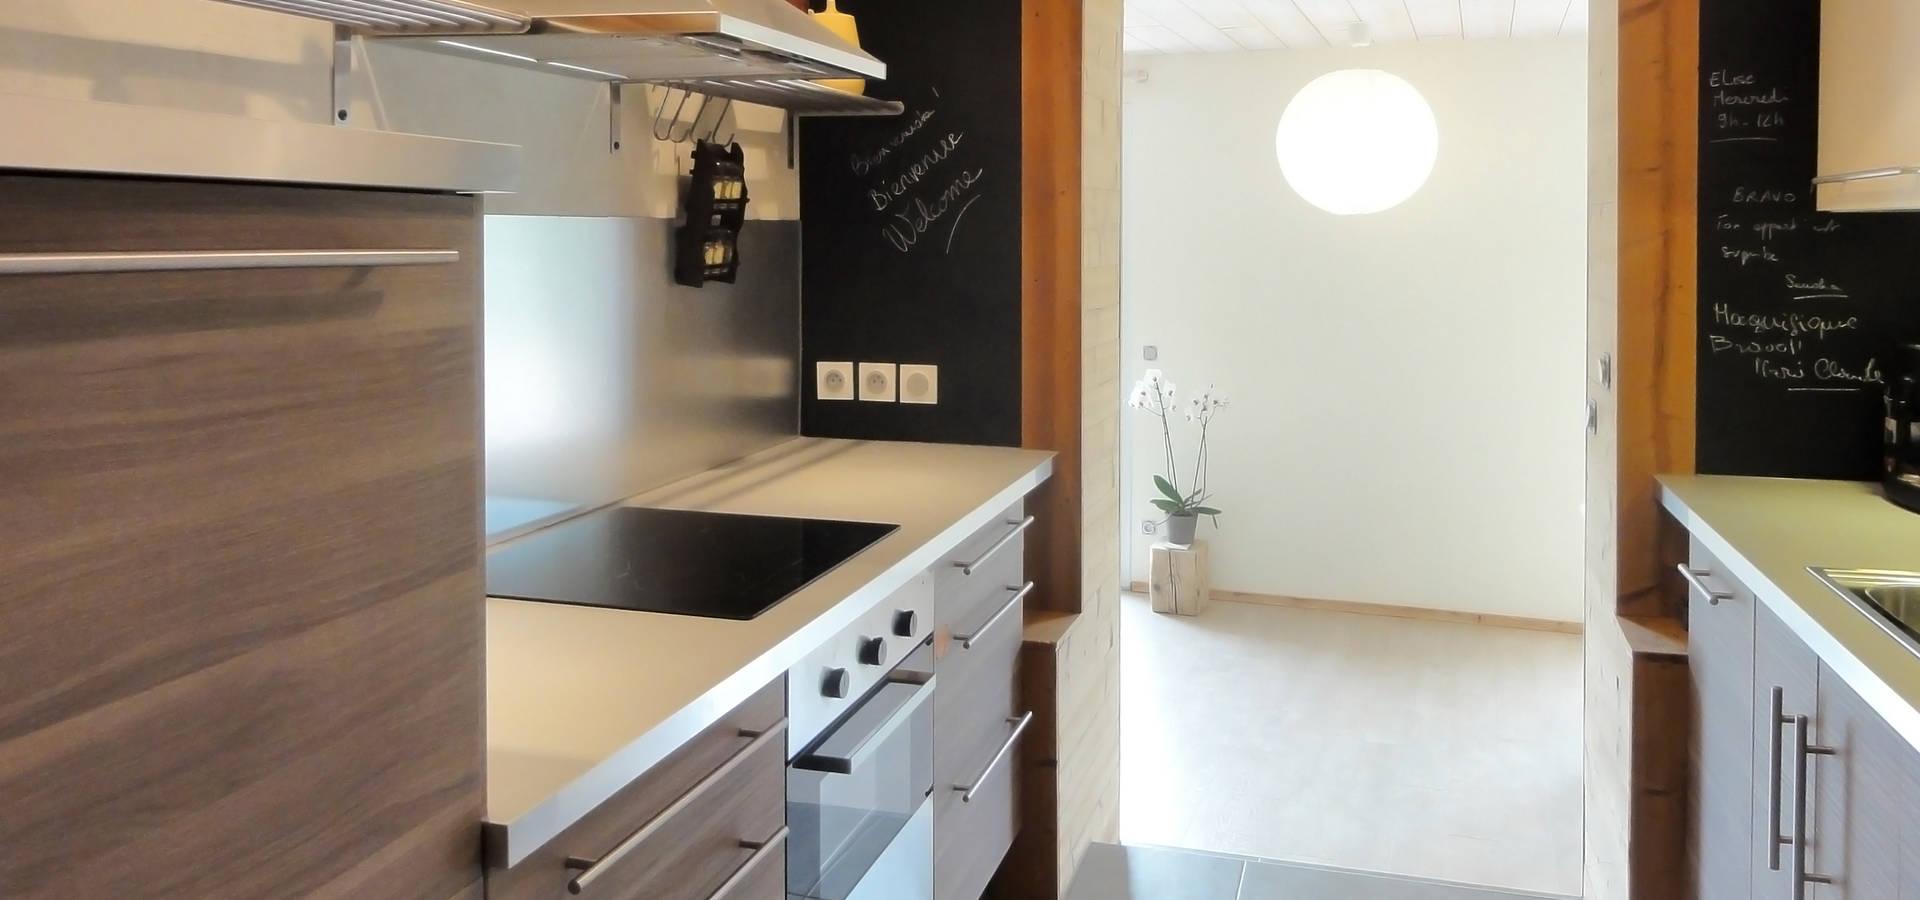 Cuisine Ikea Bois Et Moderne By Cosyneve Amandine Revel Homify